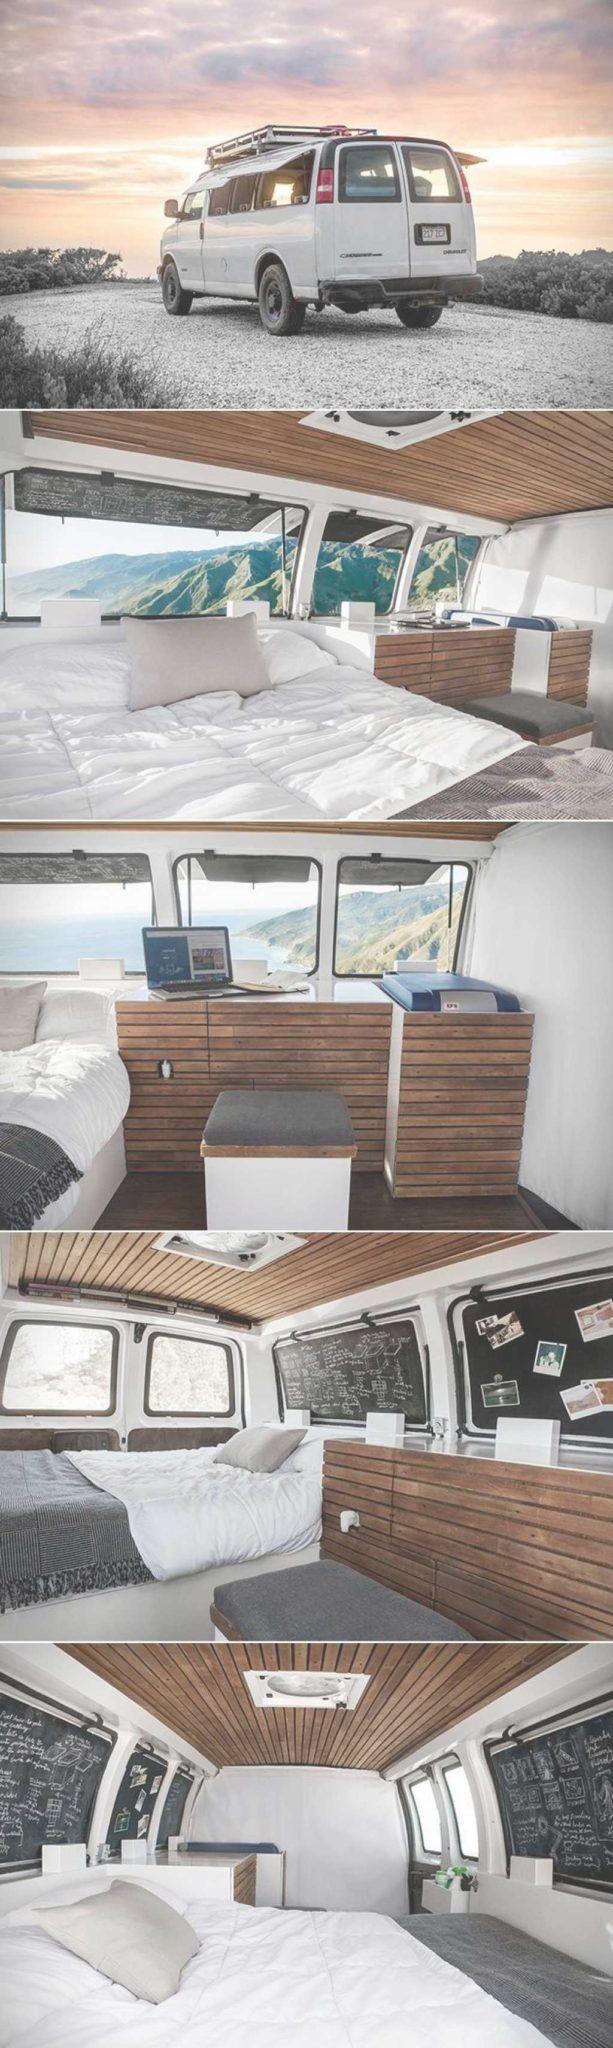 299 Best Rv & Camper Van Living Remodel Tips To Make Your Camper Trip Awesome